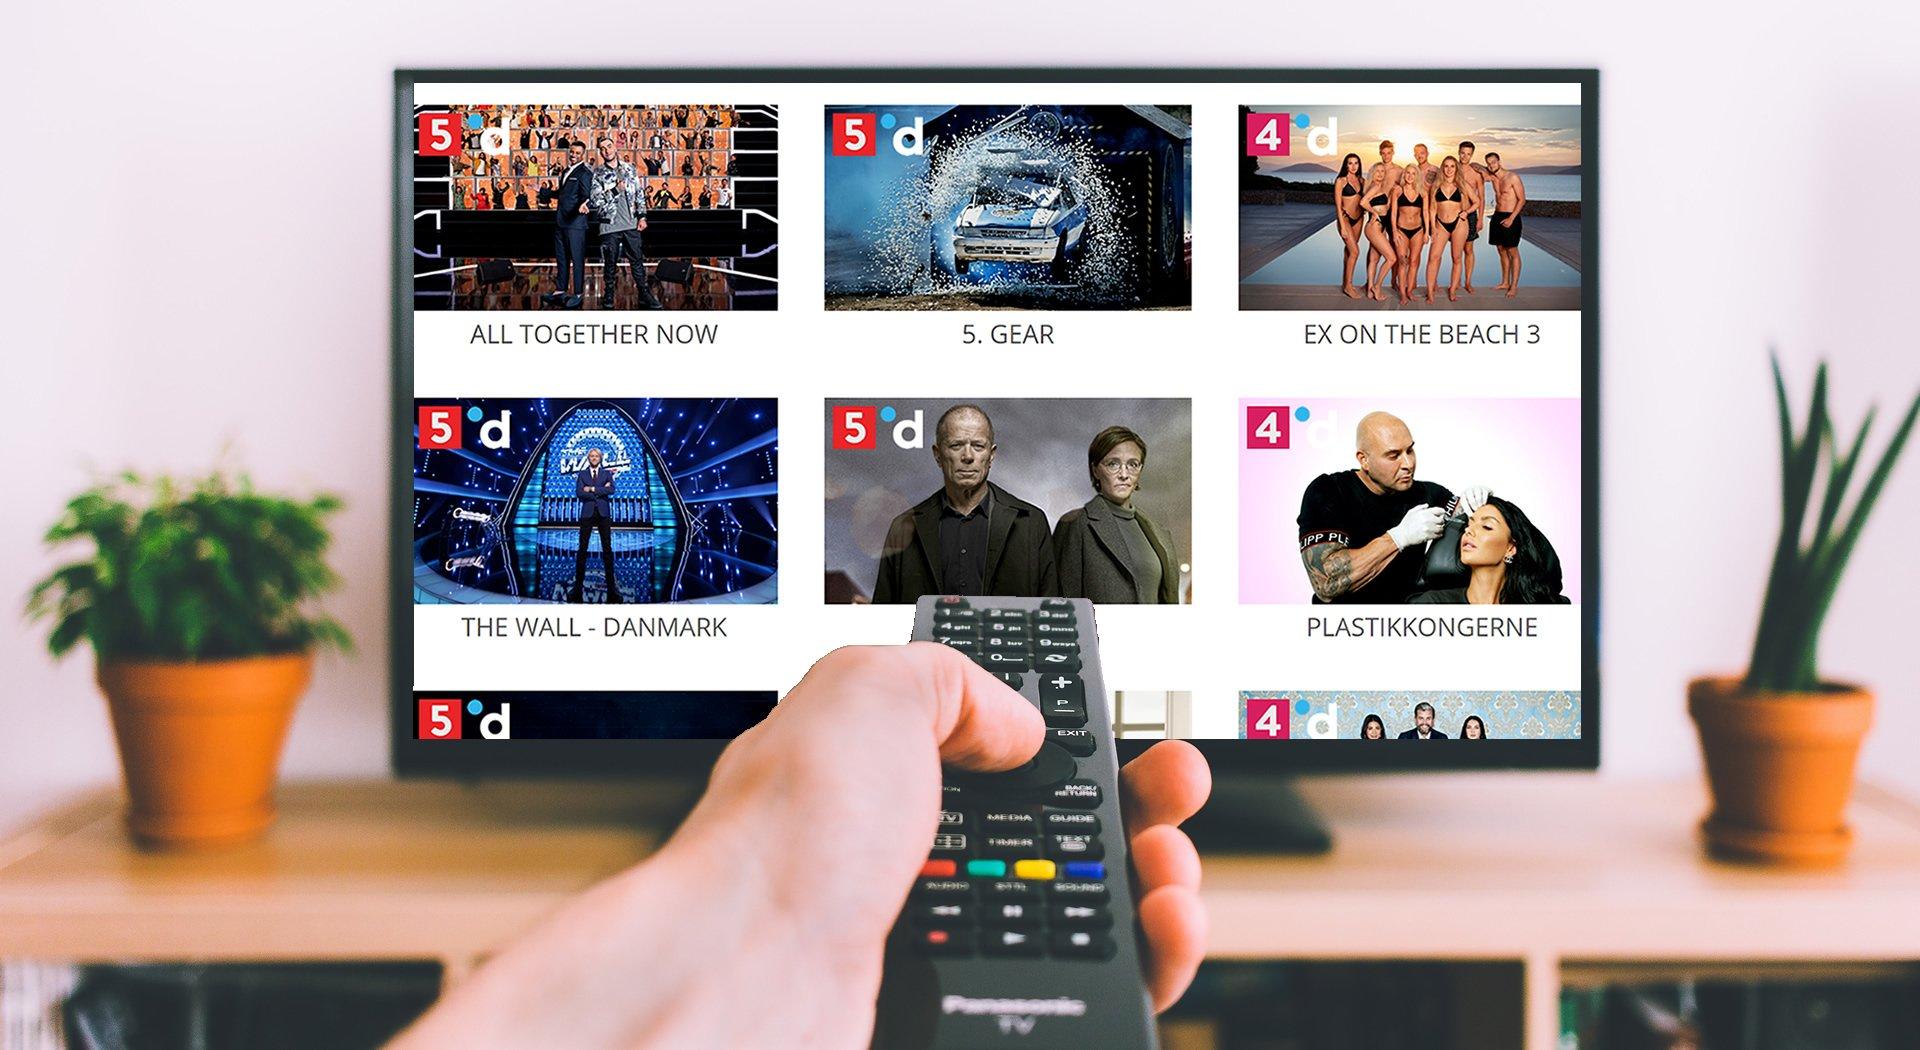 Kanal 4 Kanal 5 Efterår 2019